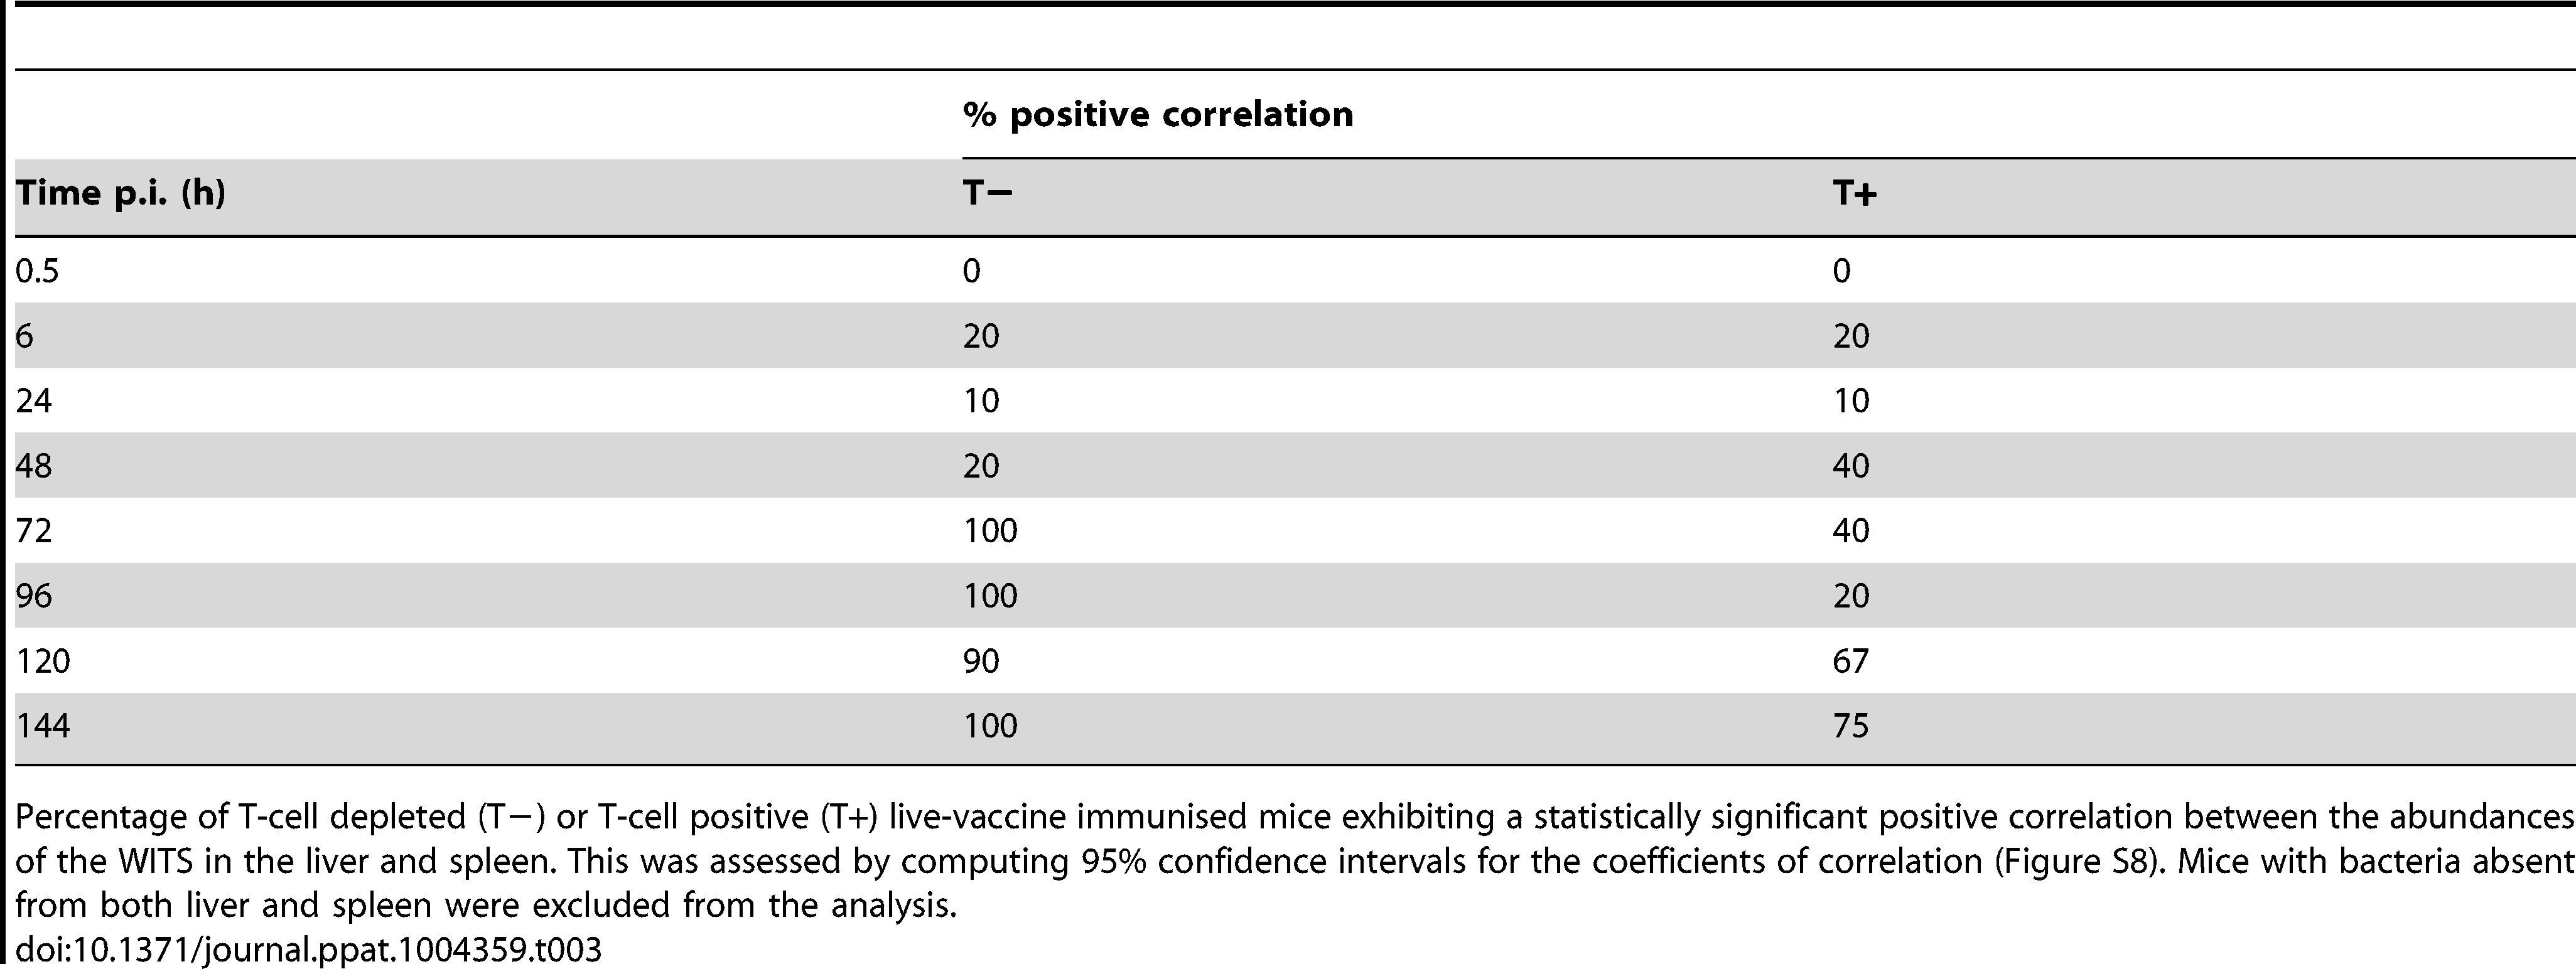 Increase in correlation between organ bacterial populations over time.